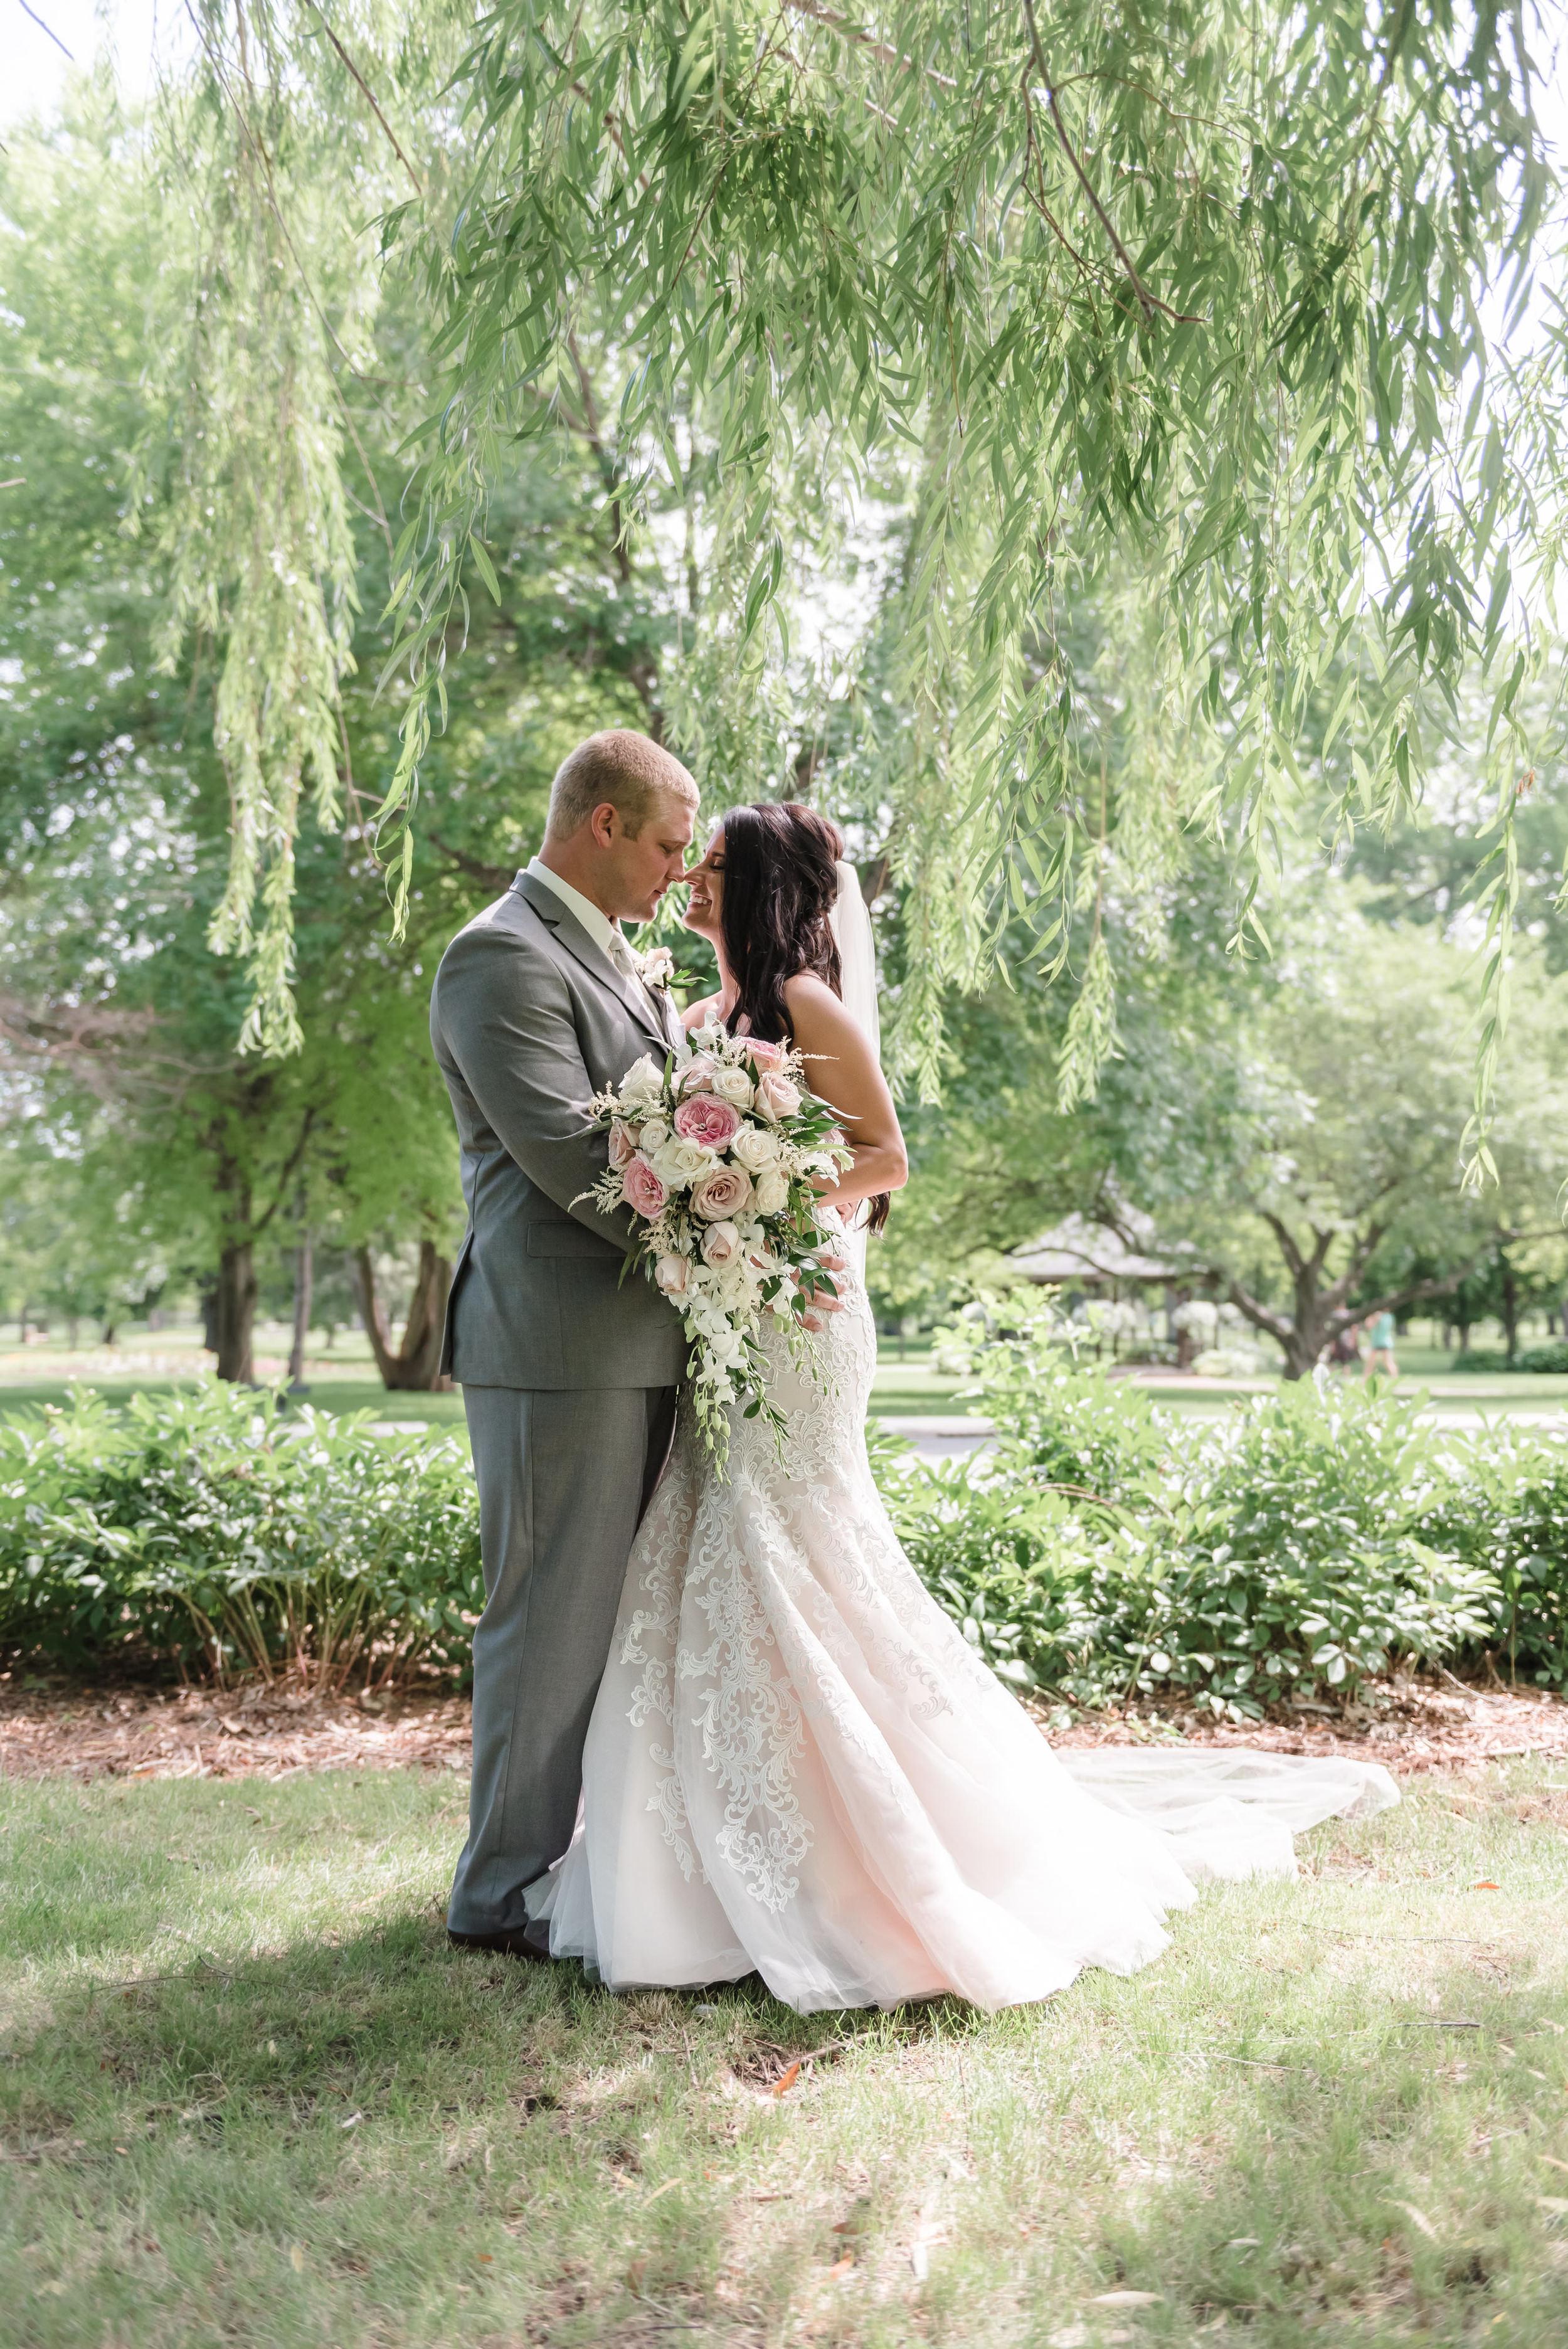 Layce and Brandon - Wedding - Outdoor Portraits-7.jpg